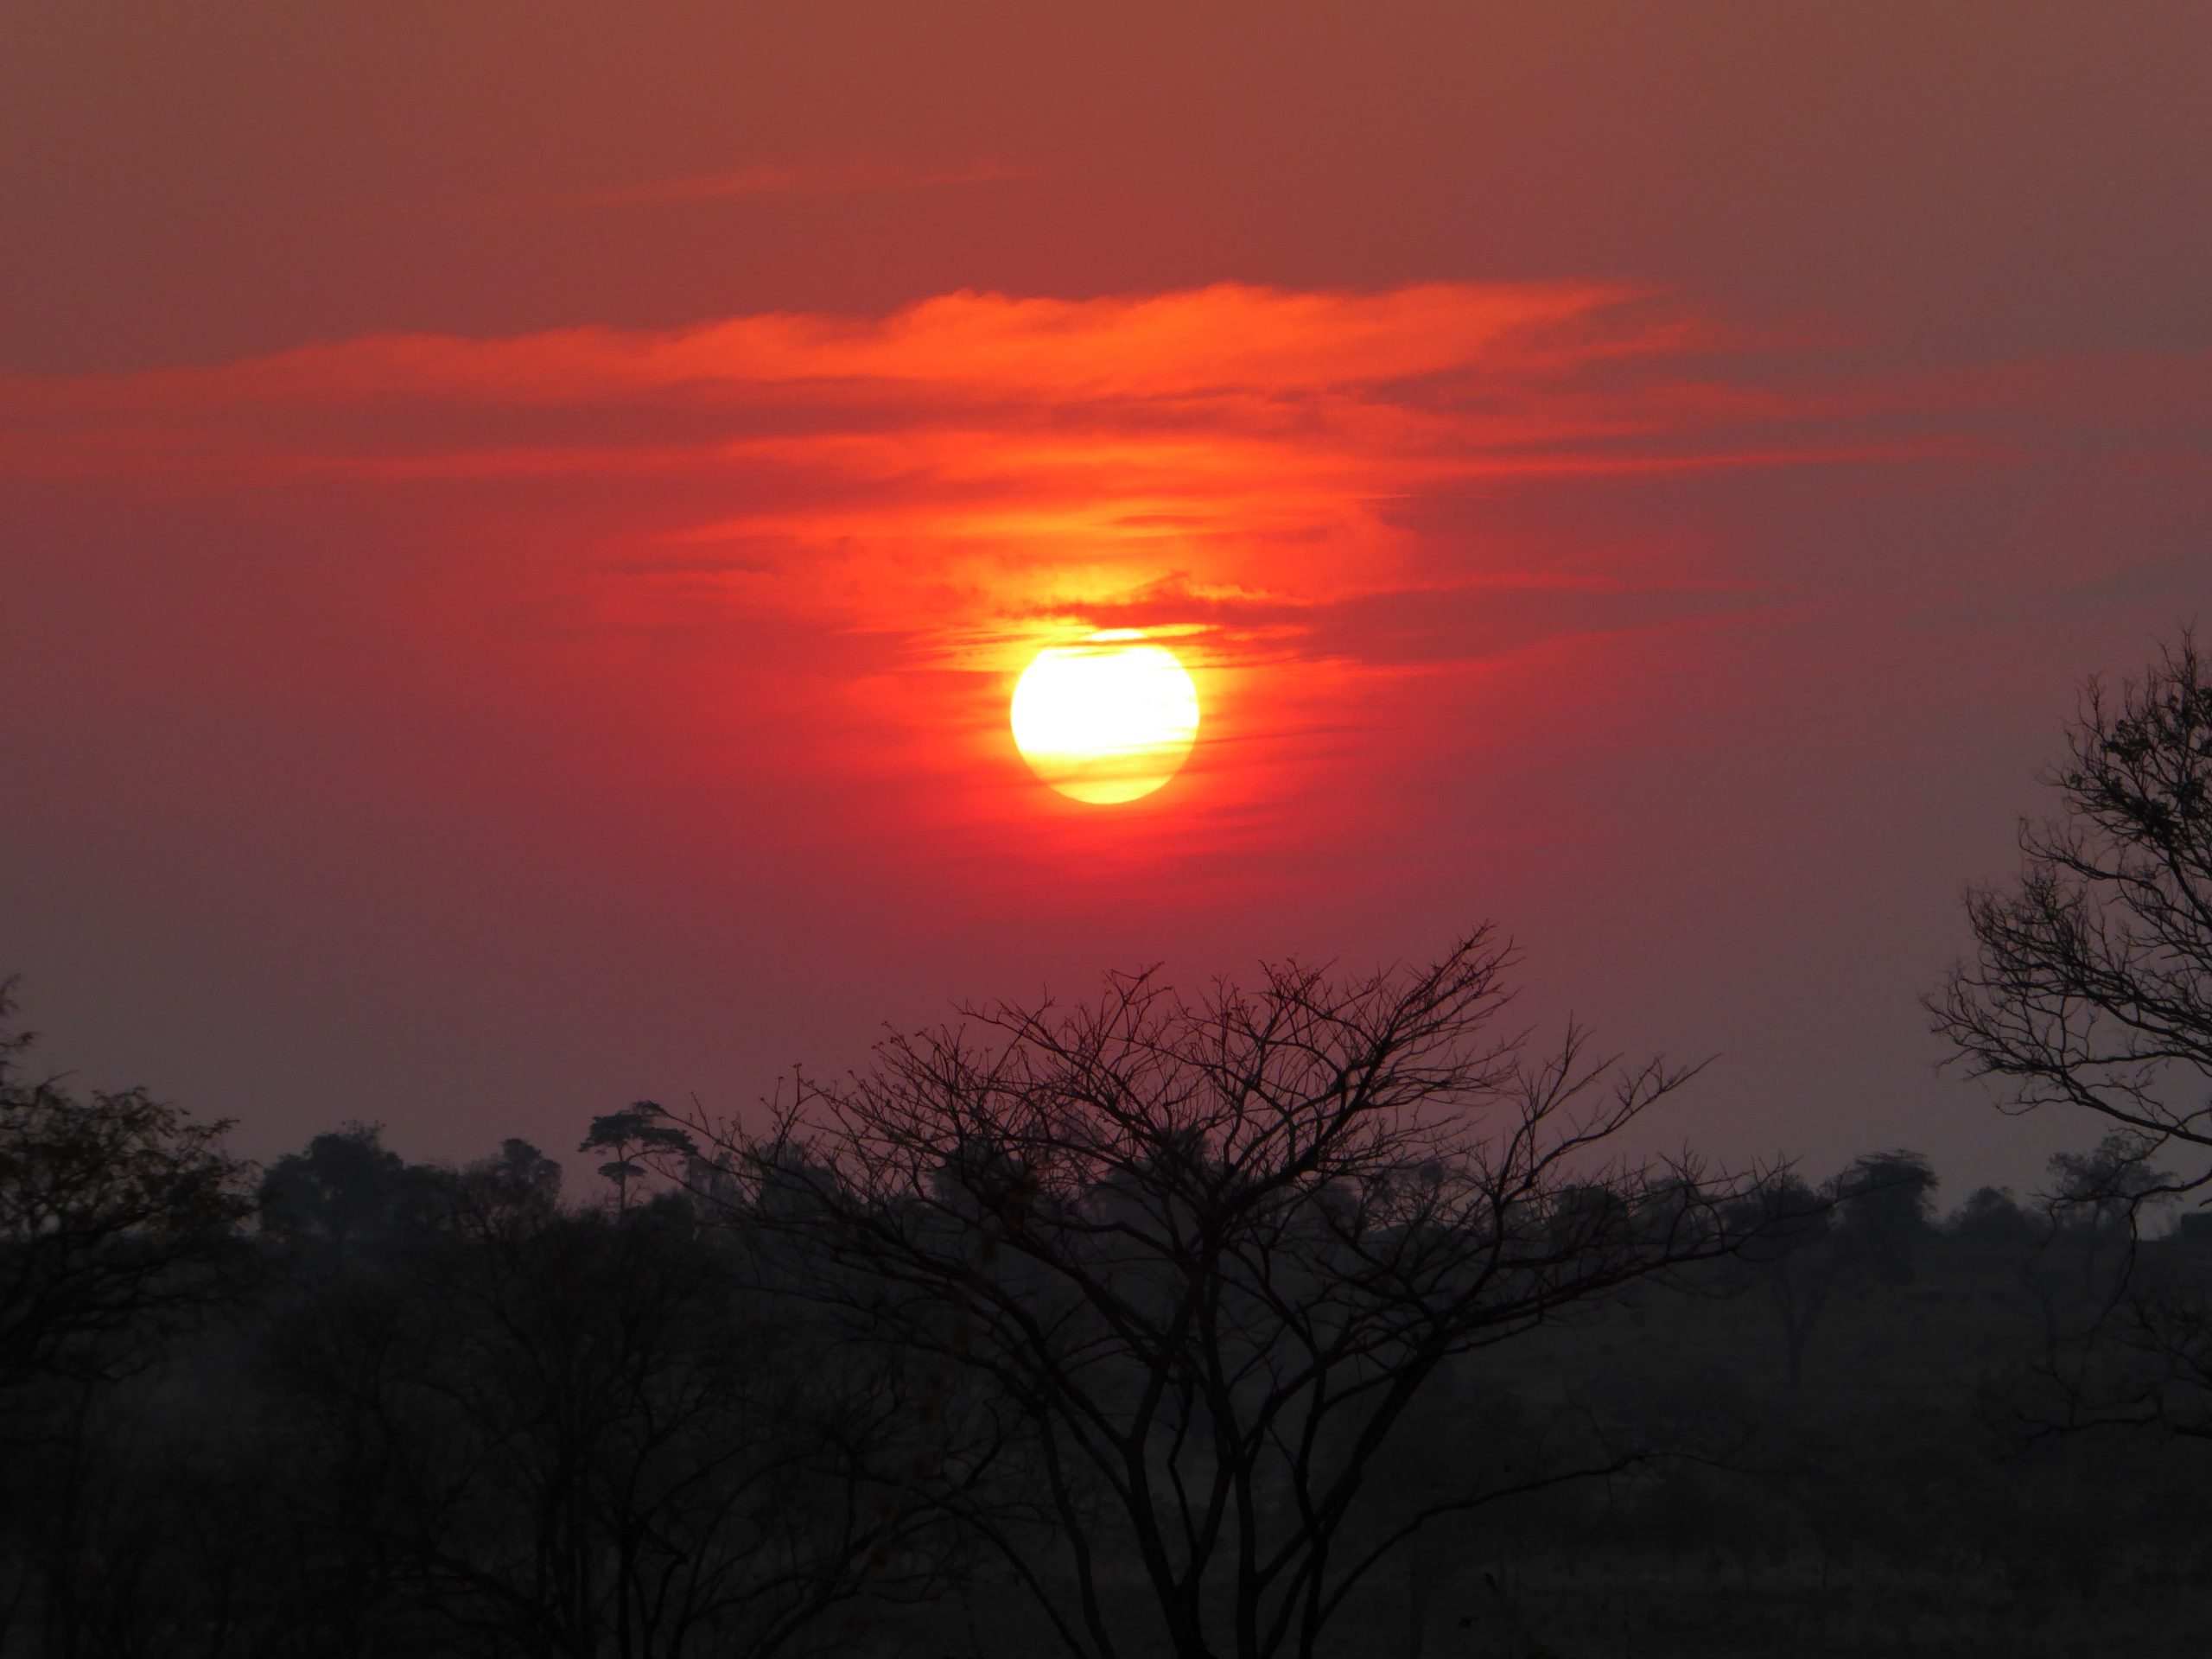 Radreise Afrika 2014 - Sonnenuntergang